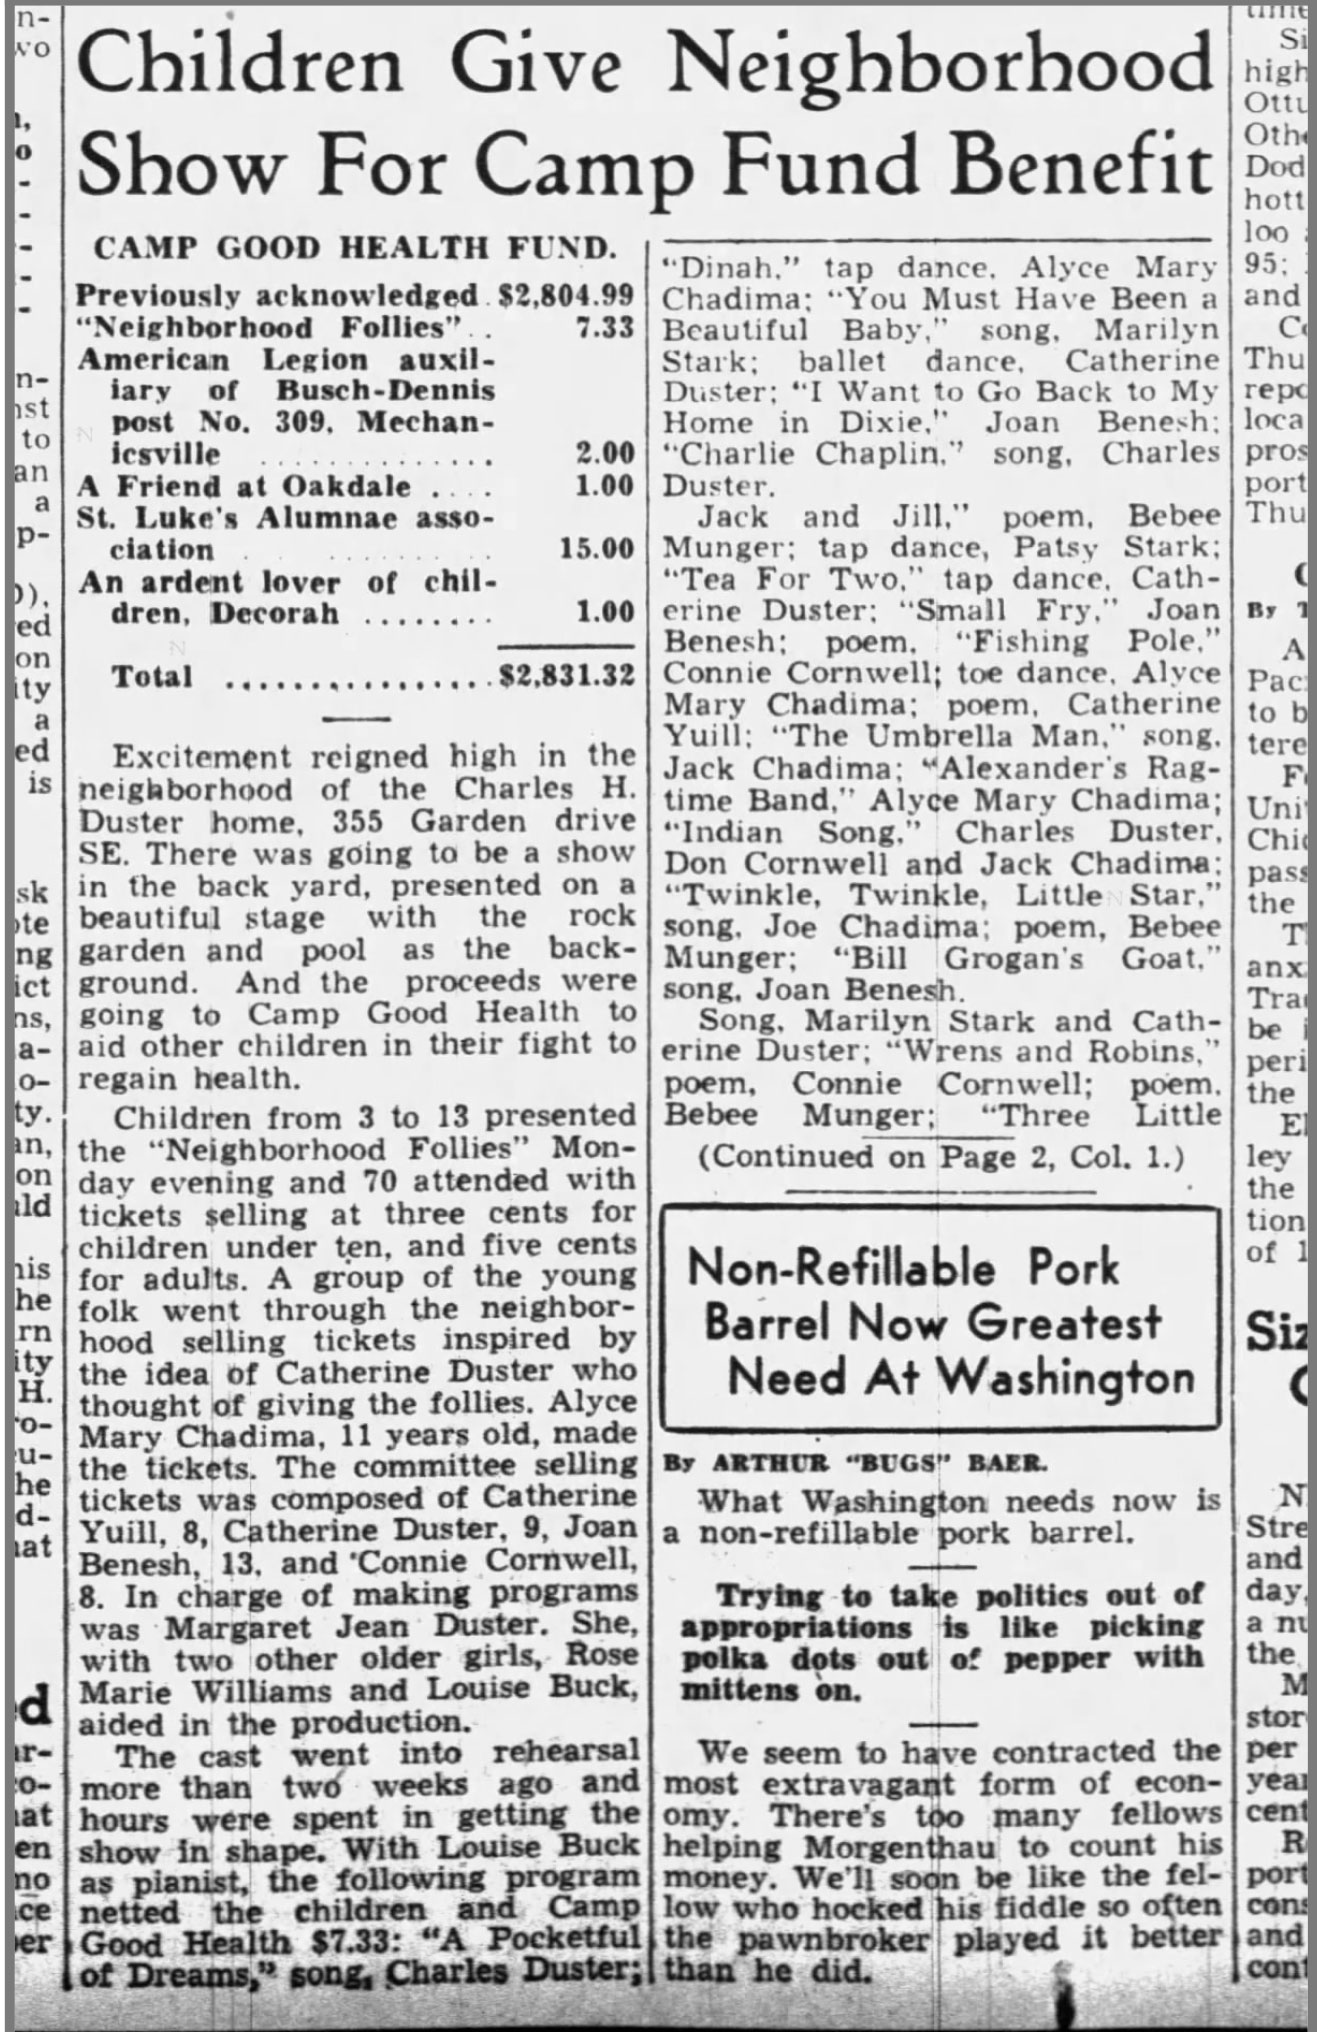 A 1939 front page article in the Cedar Rapids Gazette